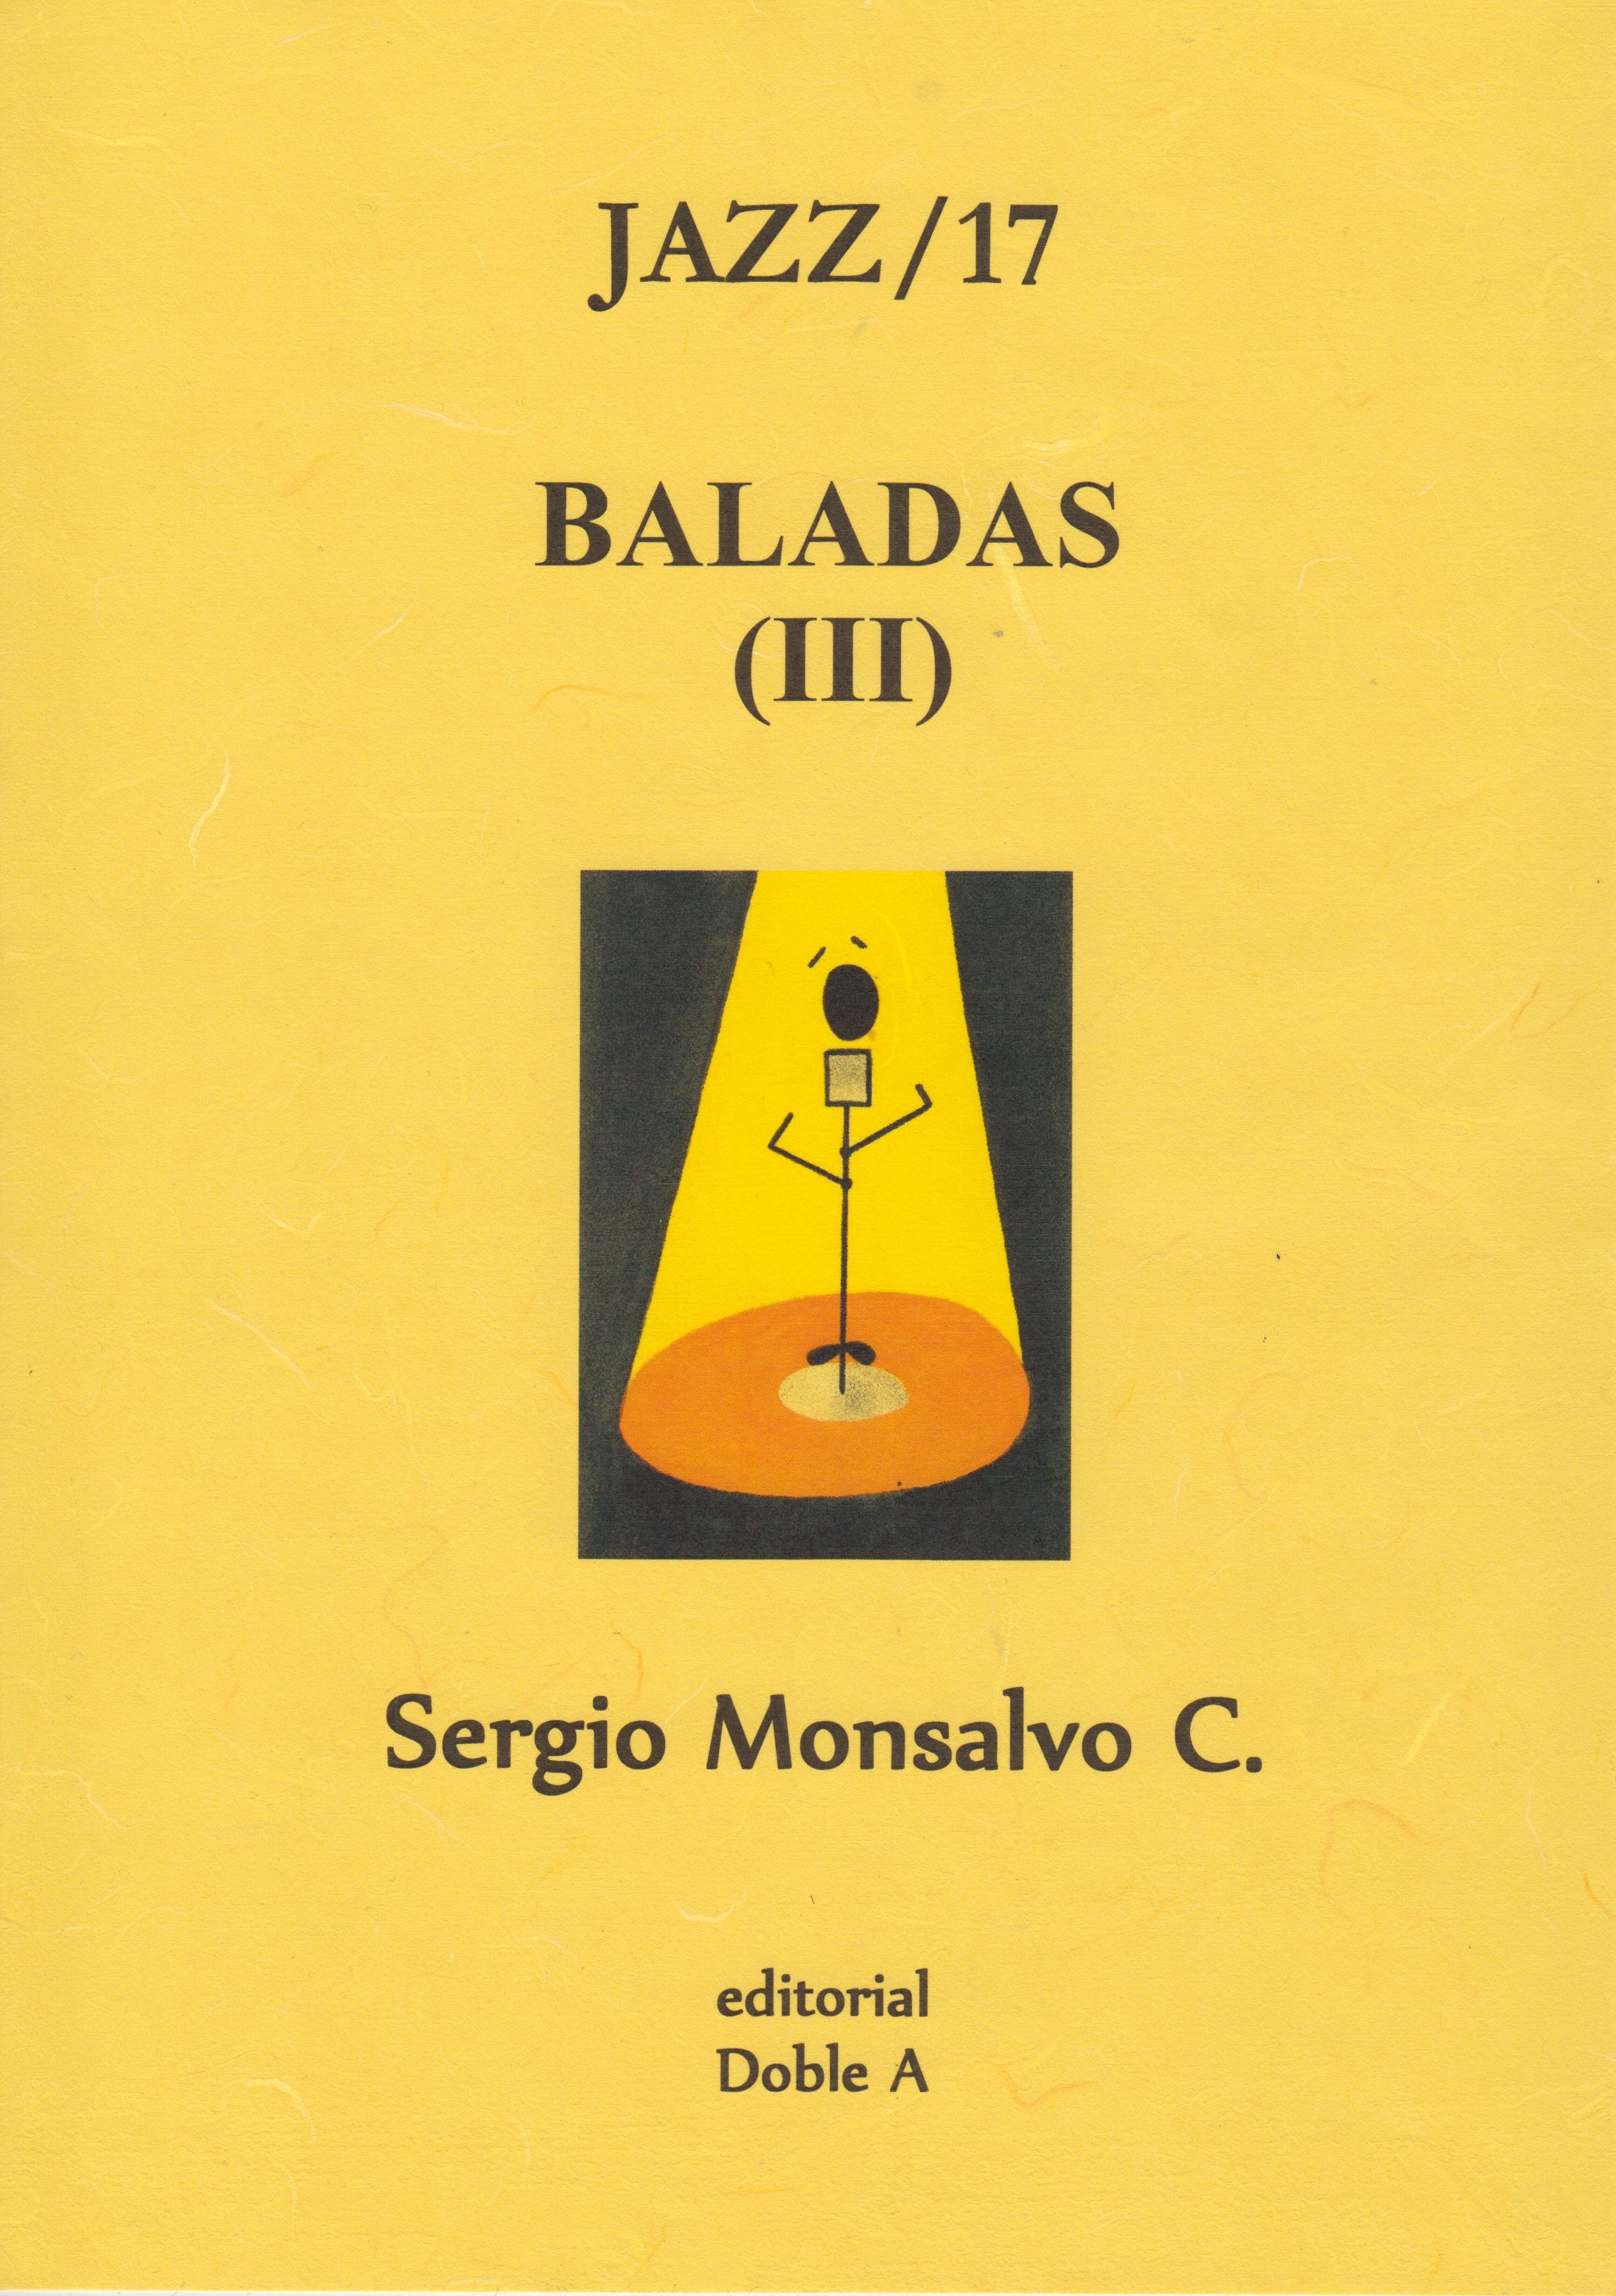 BALADAS VOL. III